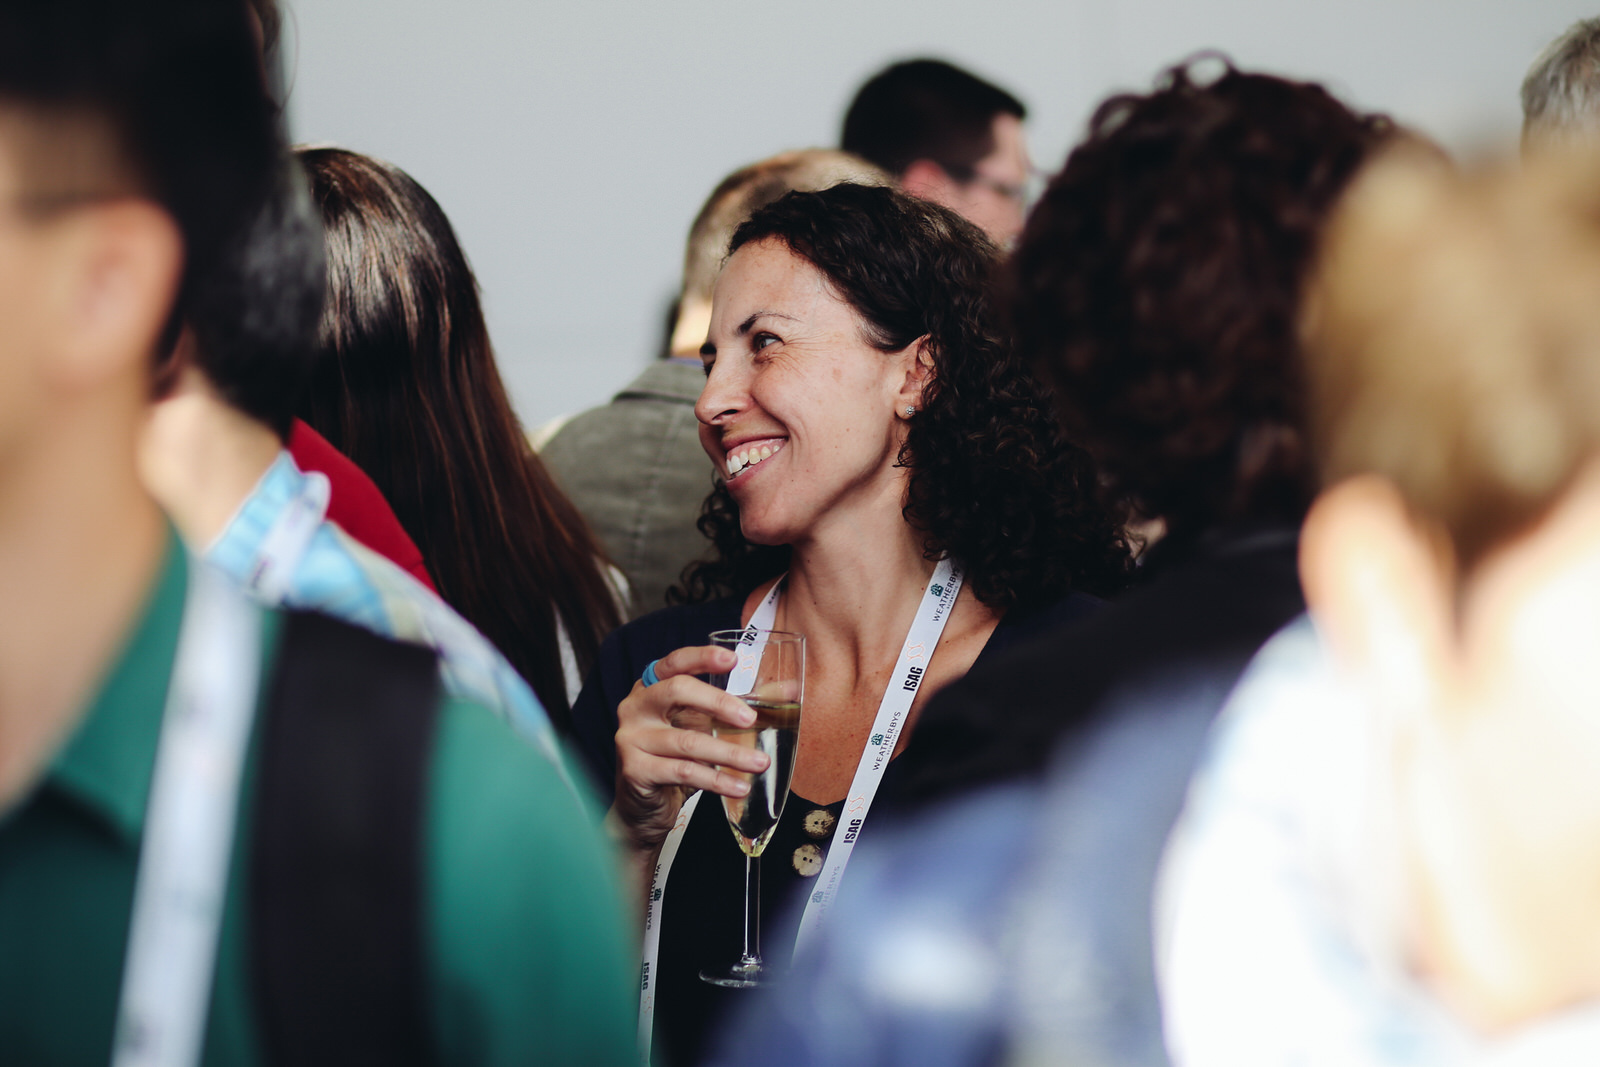 Corporate-conference-photographer-dublin-013.jpg